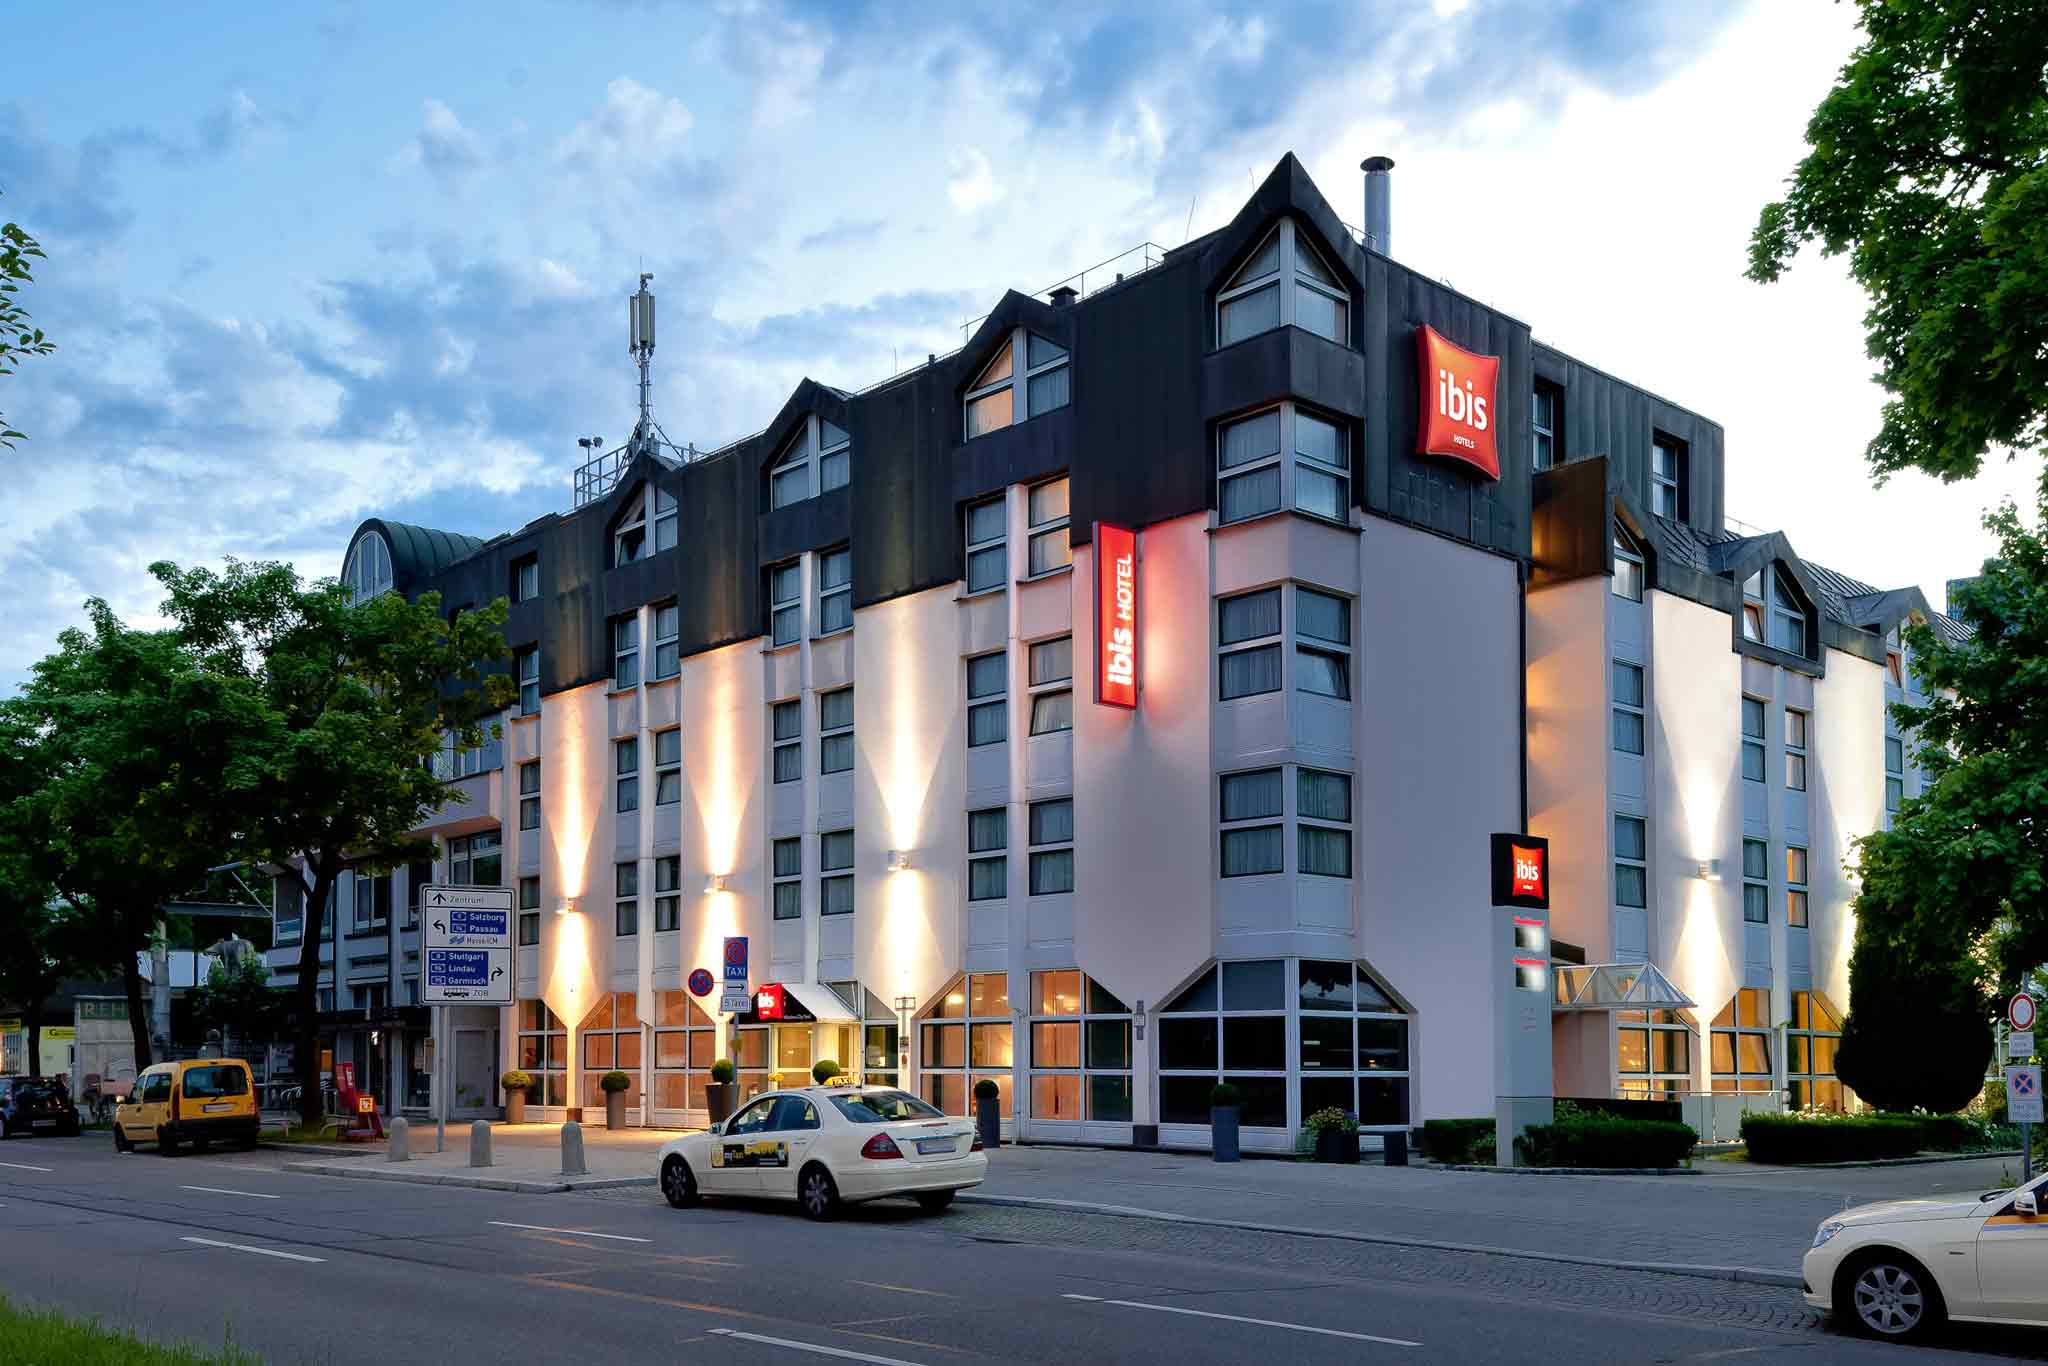 Hotel – ibis Munique Norte da Cidade